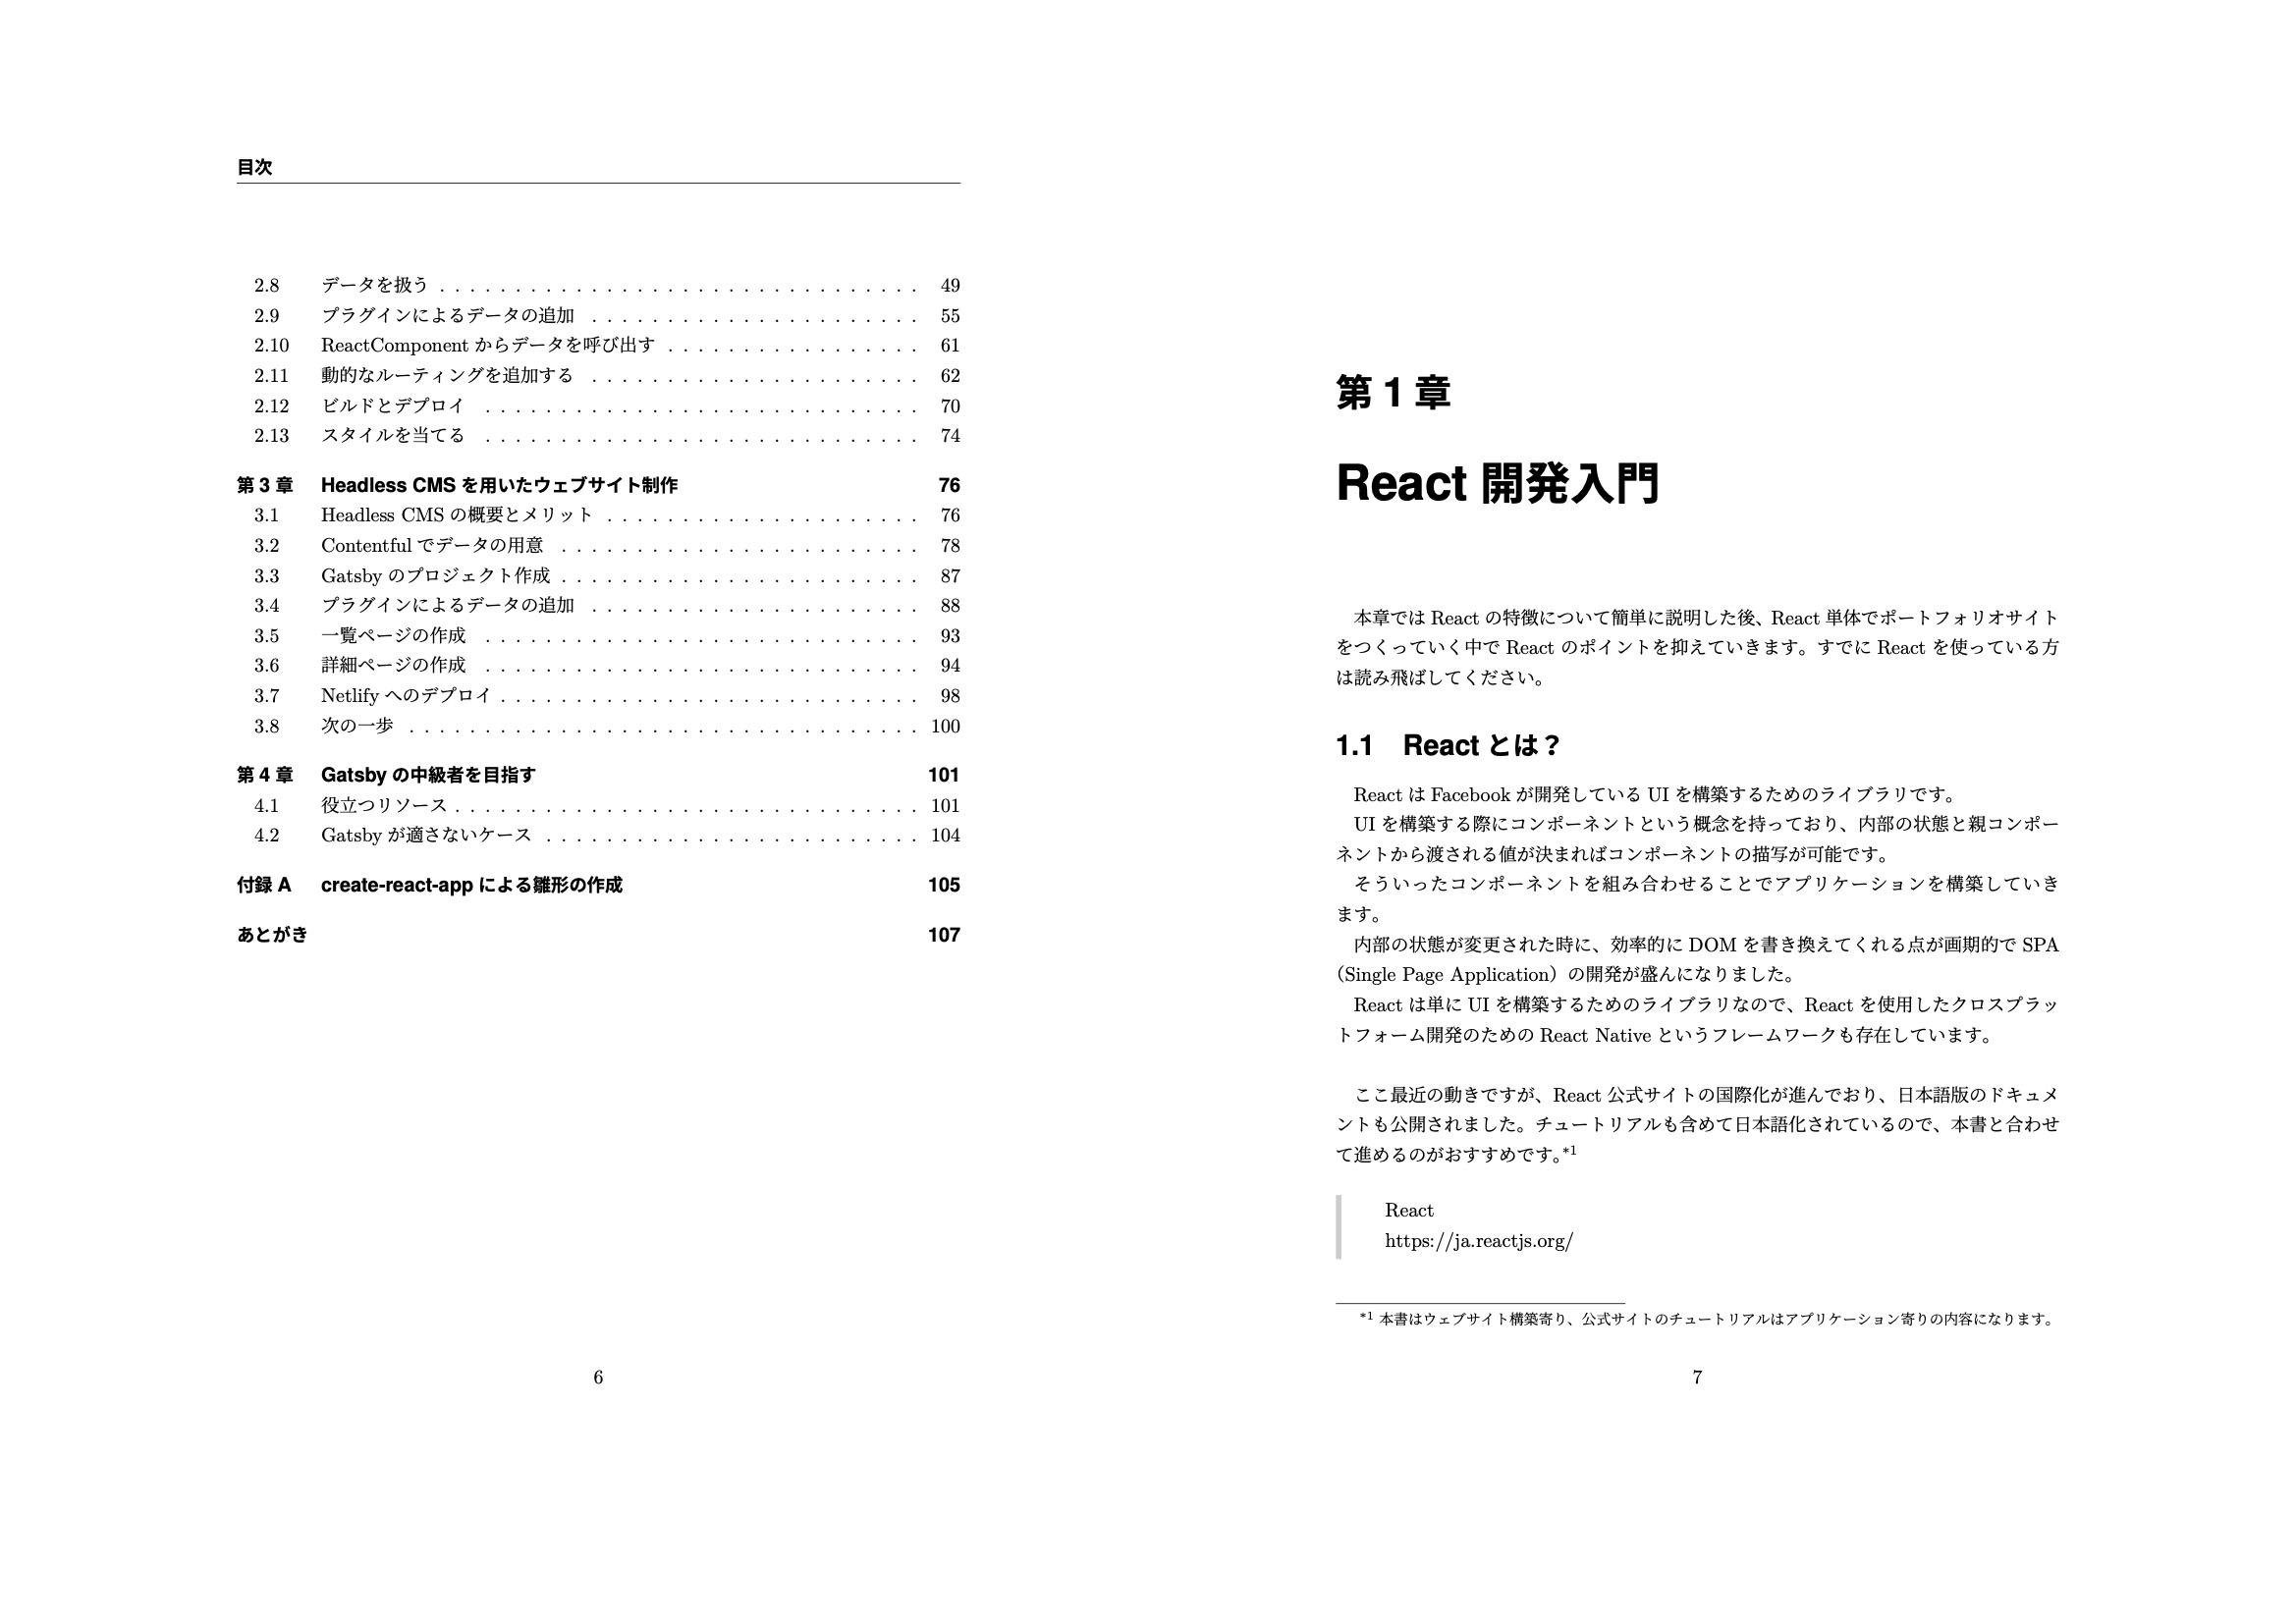 gatsby-guidebook3 3.jpeg (328.8 kB)